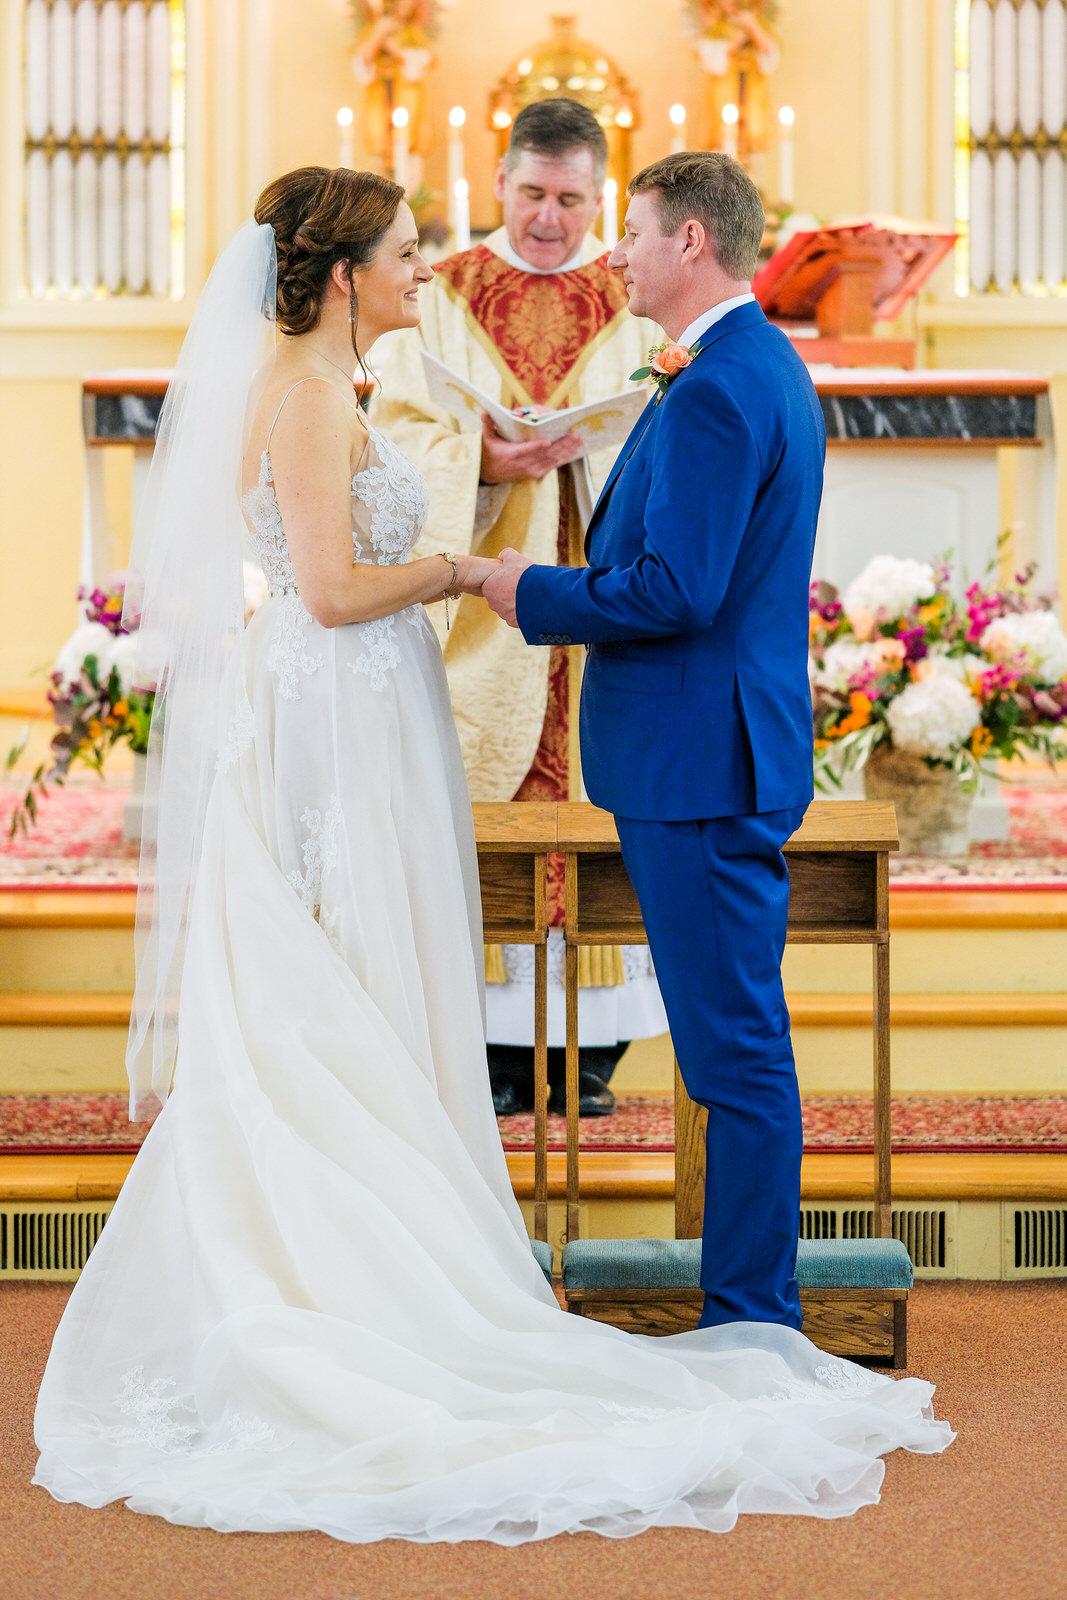 Zorvino-Vineyards-Fall-Wedding-Photography-316.jpg